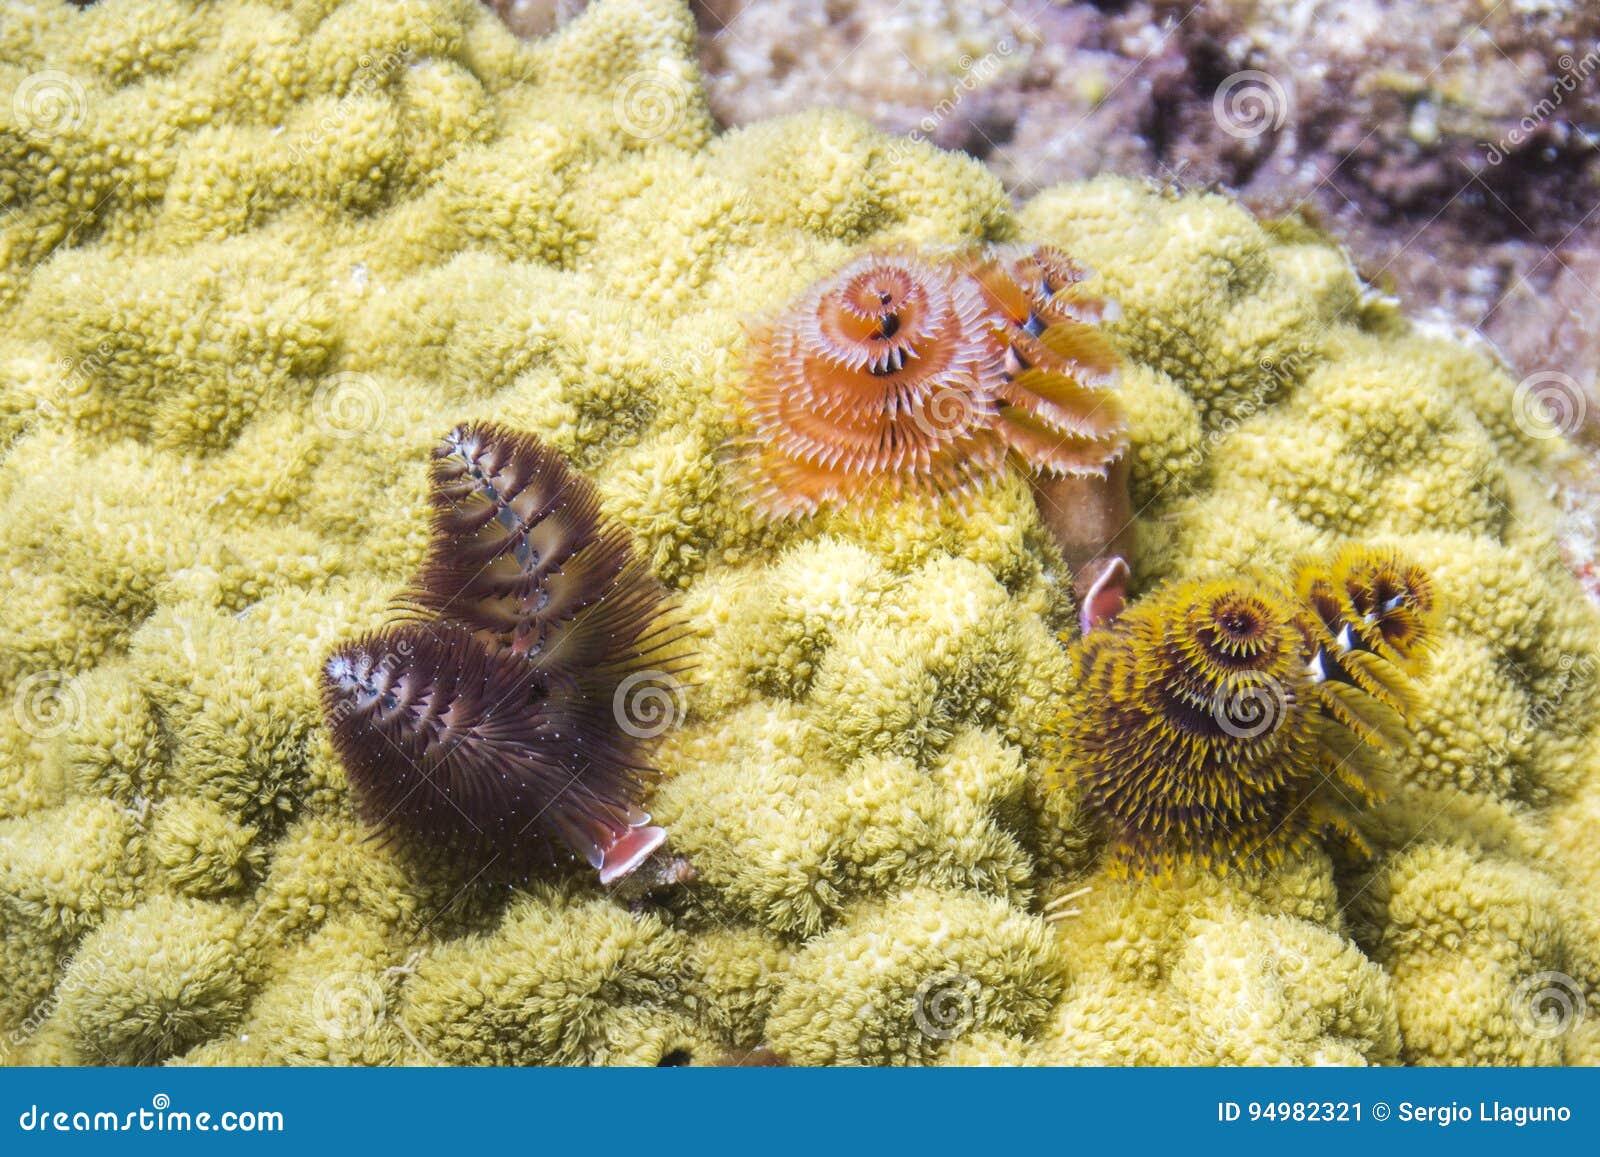 Christmas In Florida Keys.Christmas Tree Worm Stock Image Image Of Keys Barrier